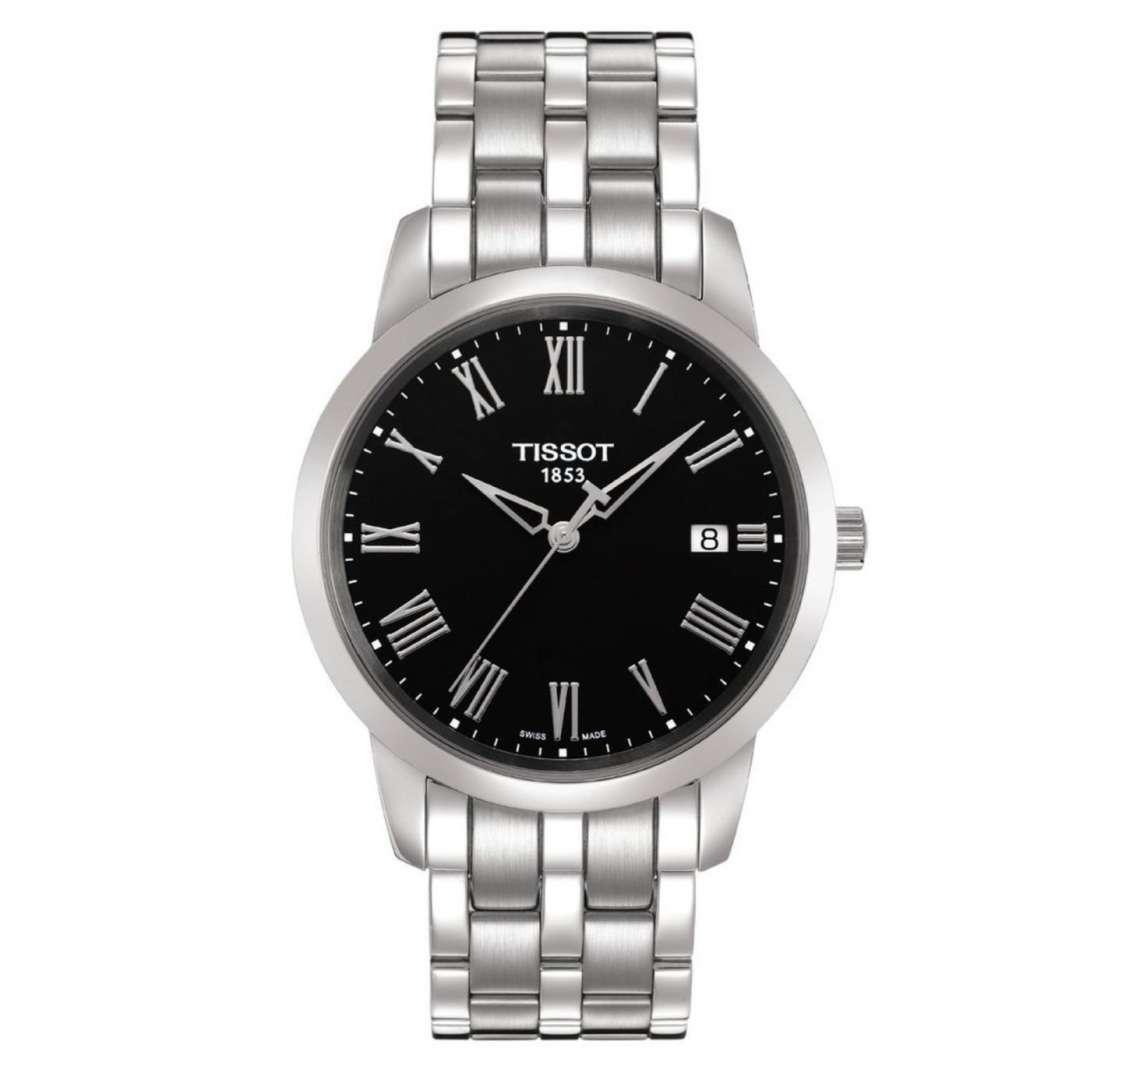 שעון יד אנלוגי tissot t033.410.11.053.00 טיסו